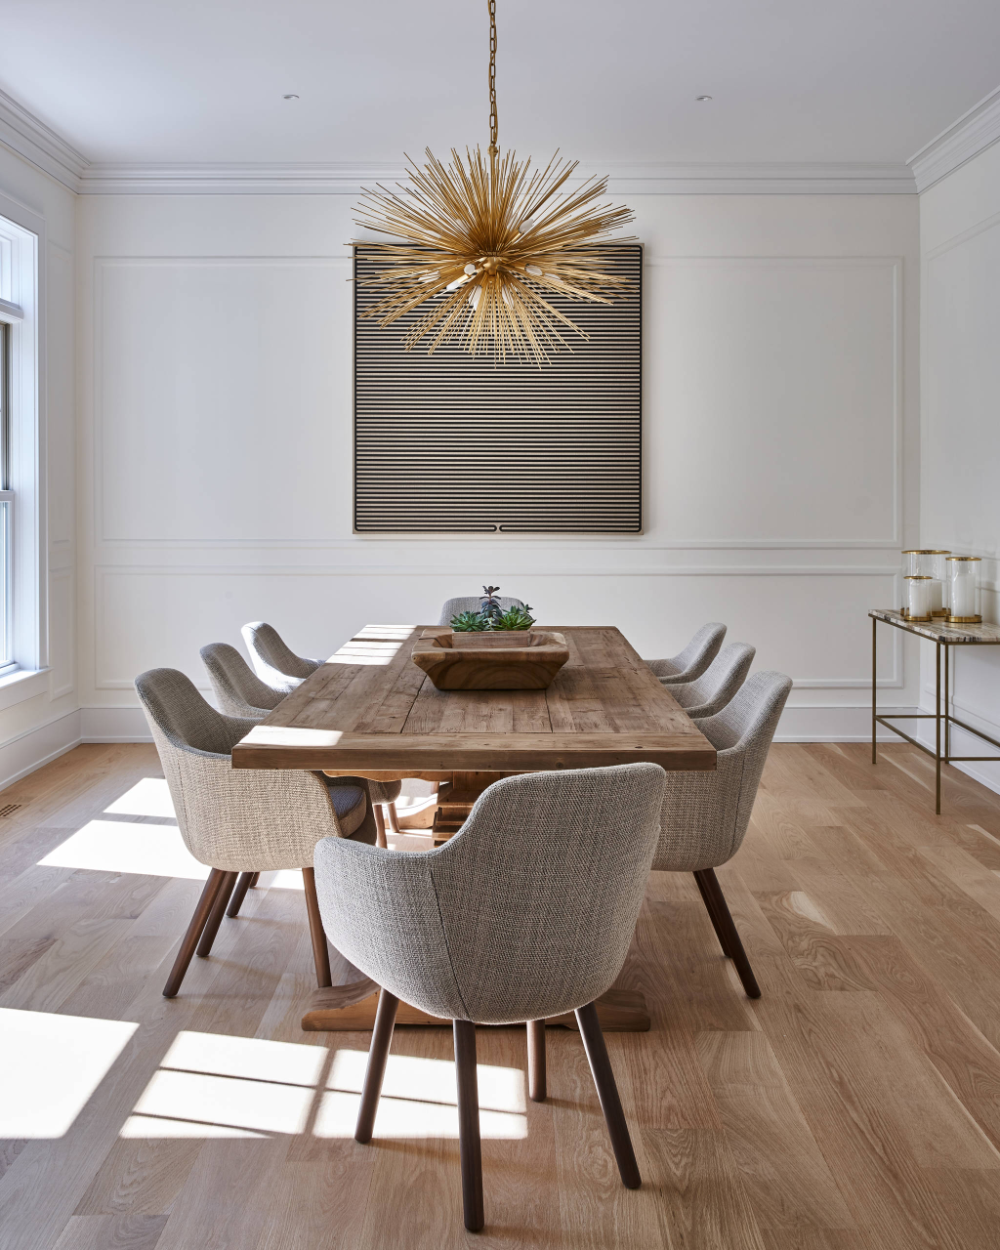 1197 Noyac Contemporary Dining Room New York By Jason Thomas Architect Minimalist Dining Room Elegant Dining Room Dining Room Small